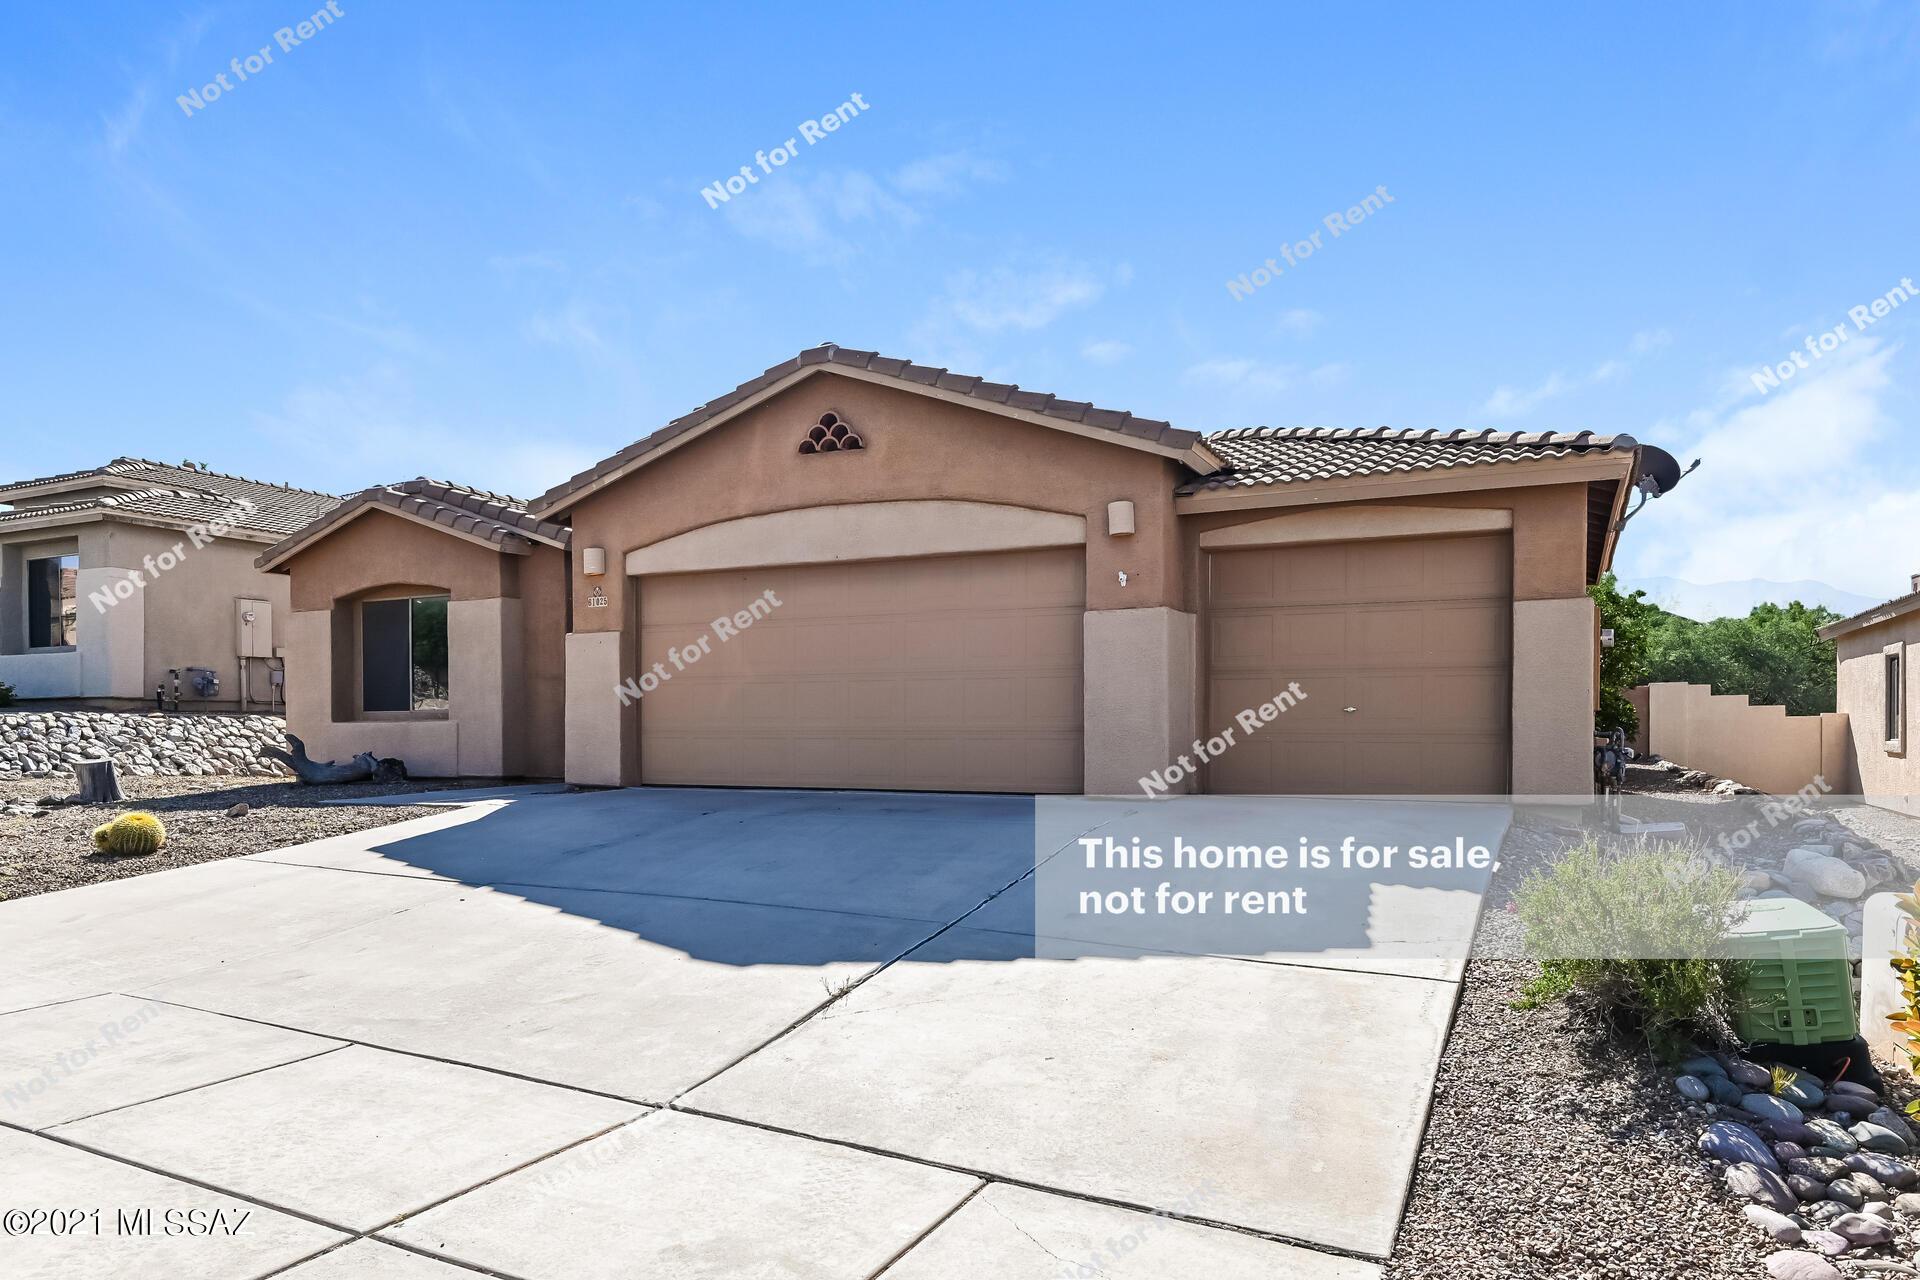 Photo of 61025 E Eagle Heights Drive, Saddlebrooke, AZ 85739